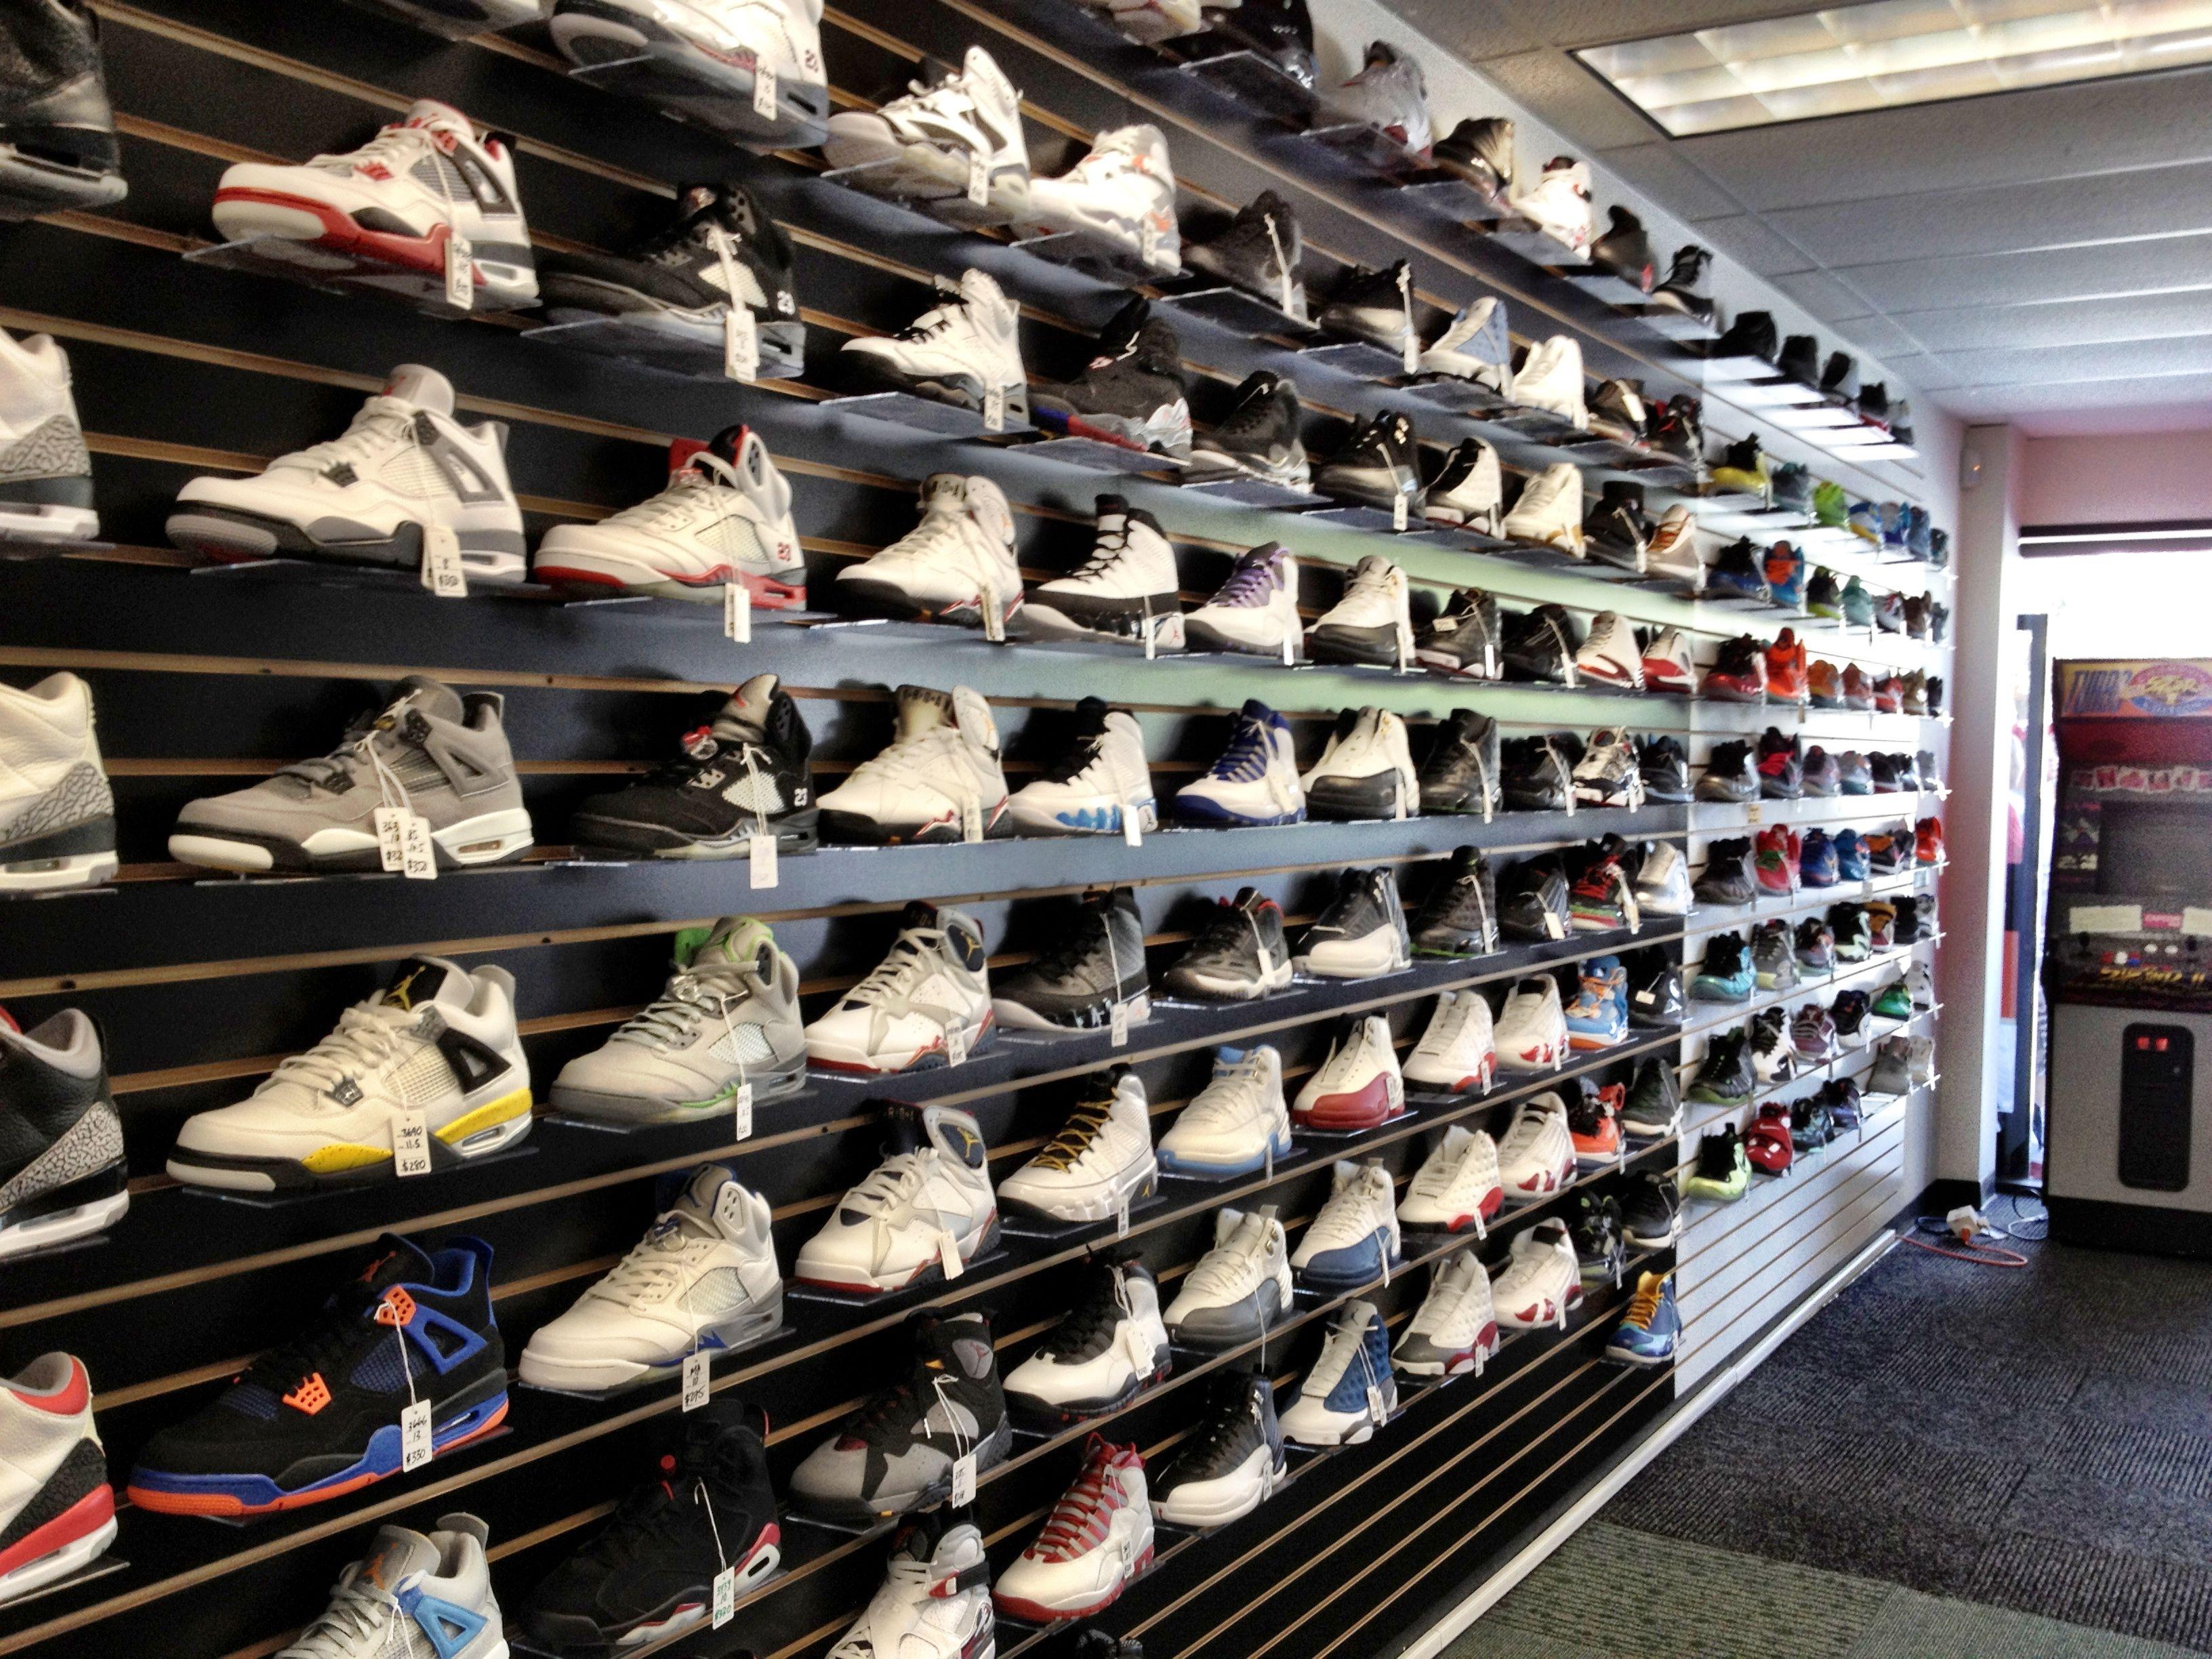 sneakerheads #jordans #nike #boutique